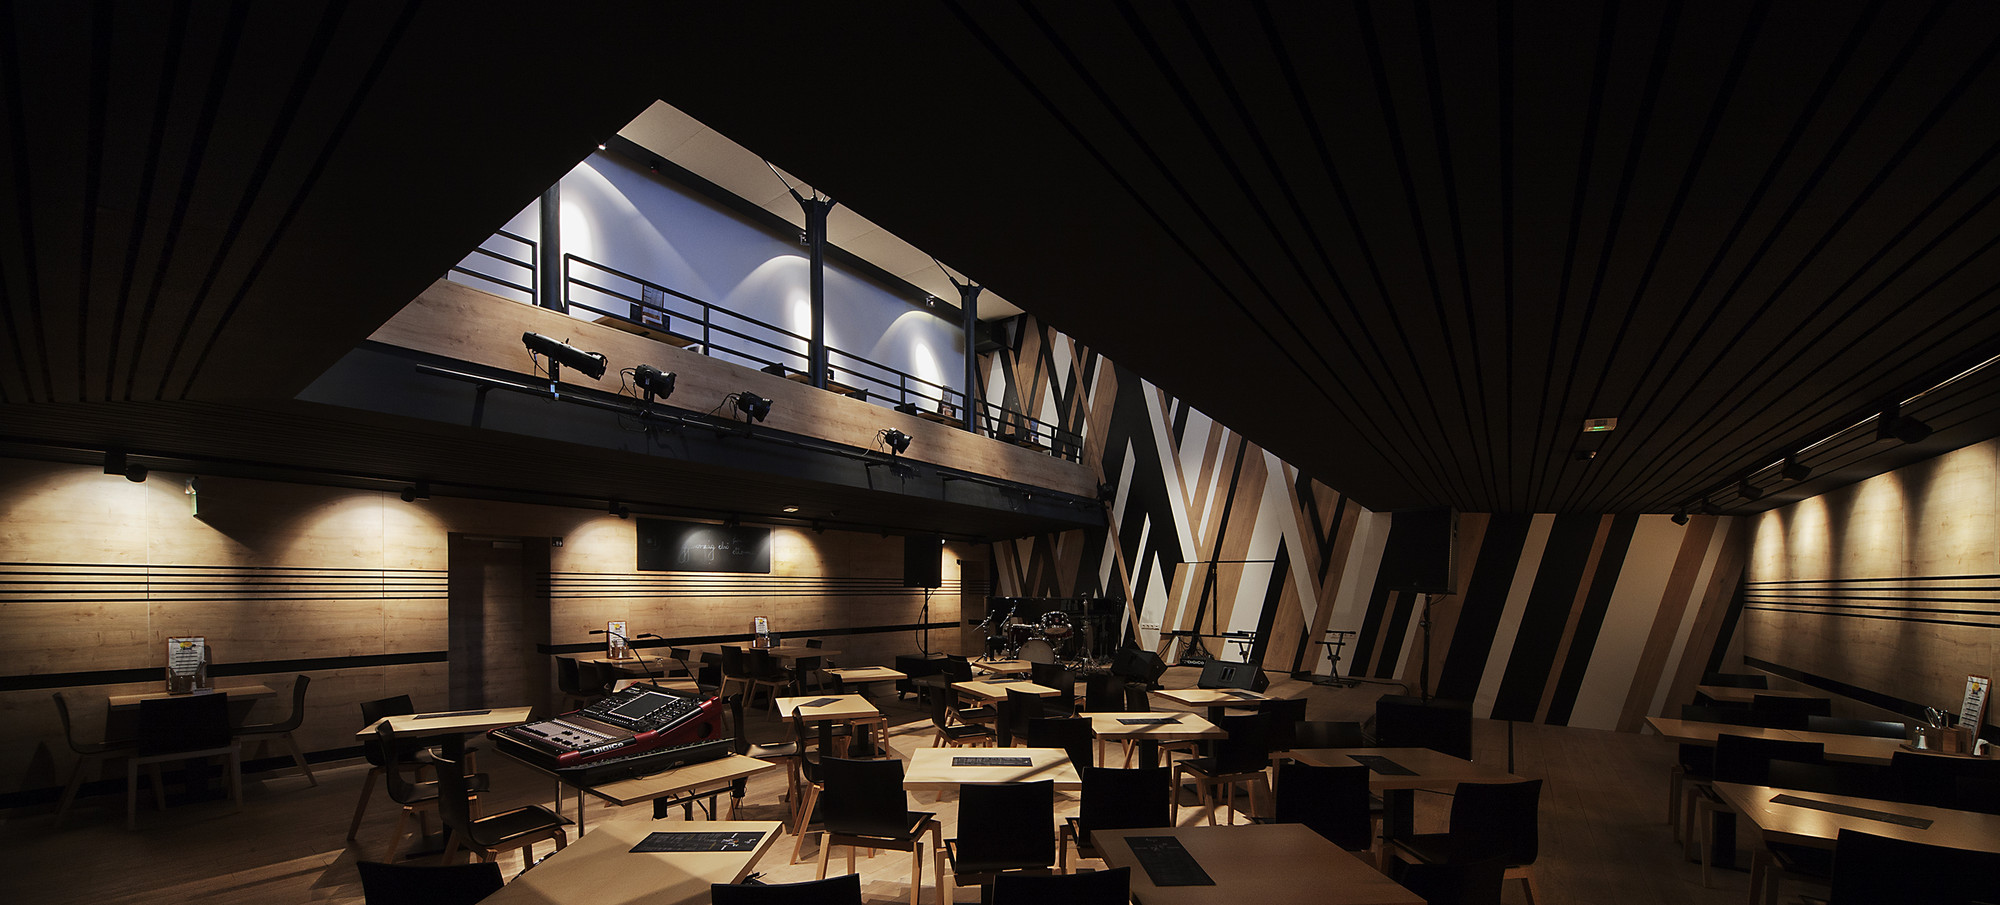 Gallery of budapest music center art1st design studio 25 - Architecture shows ...